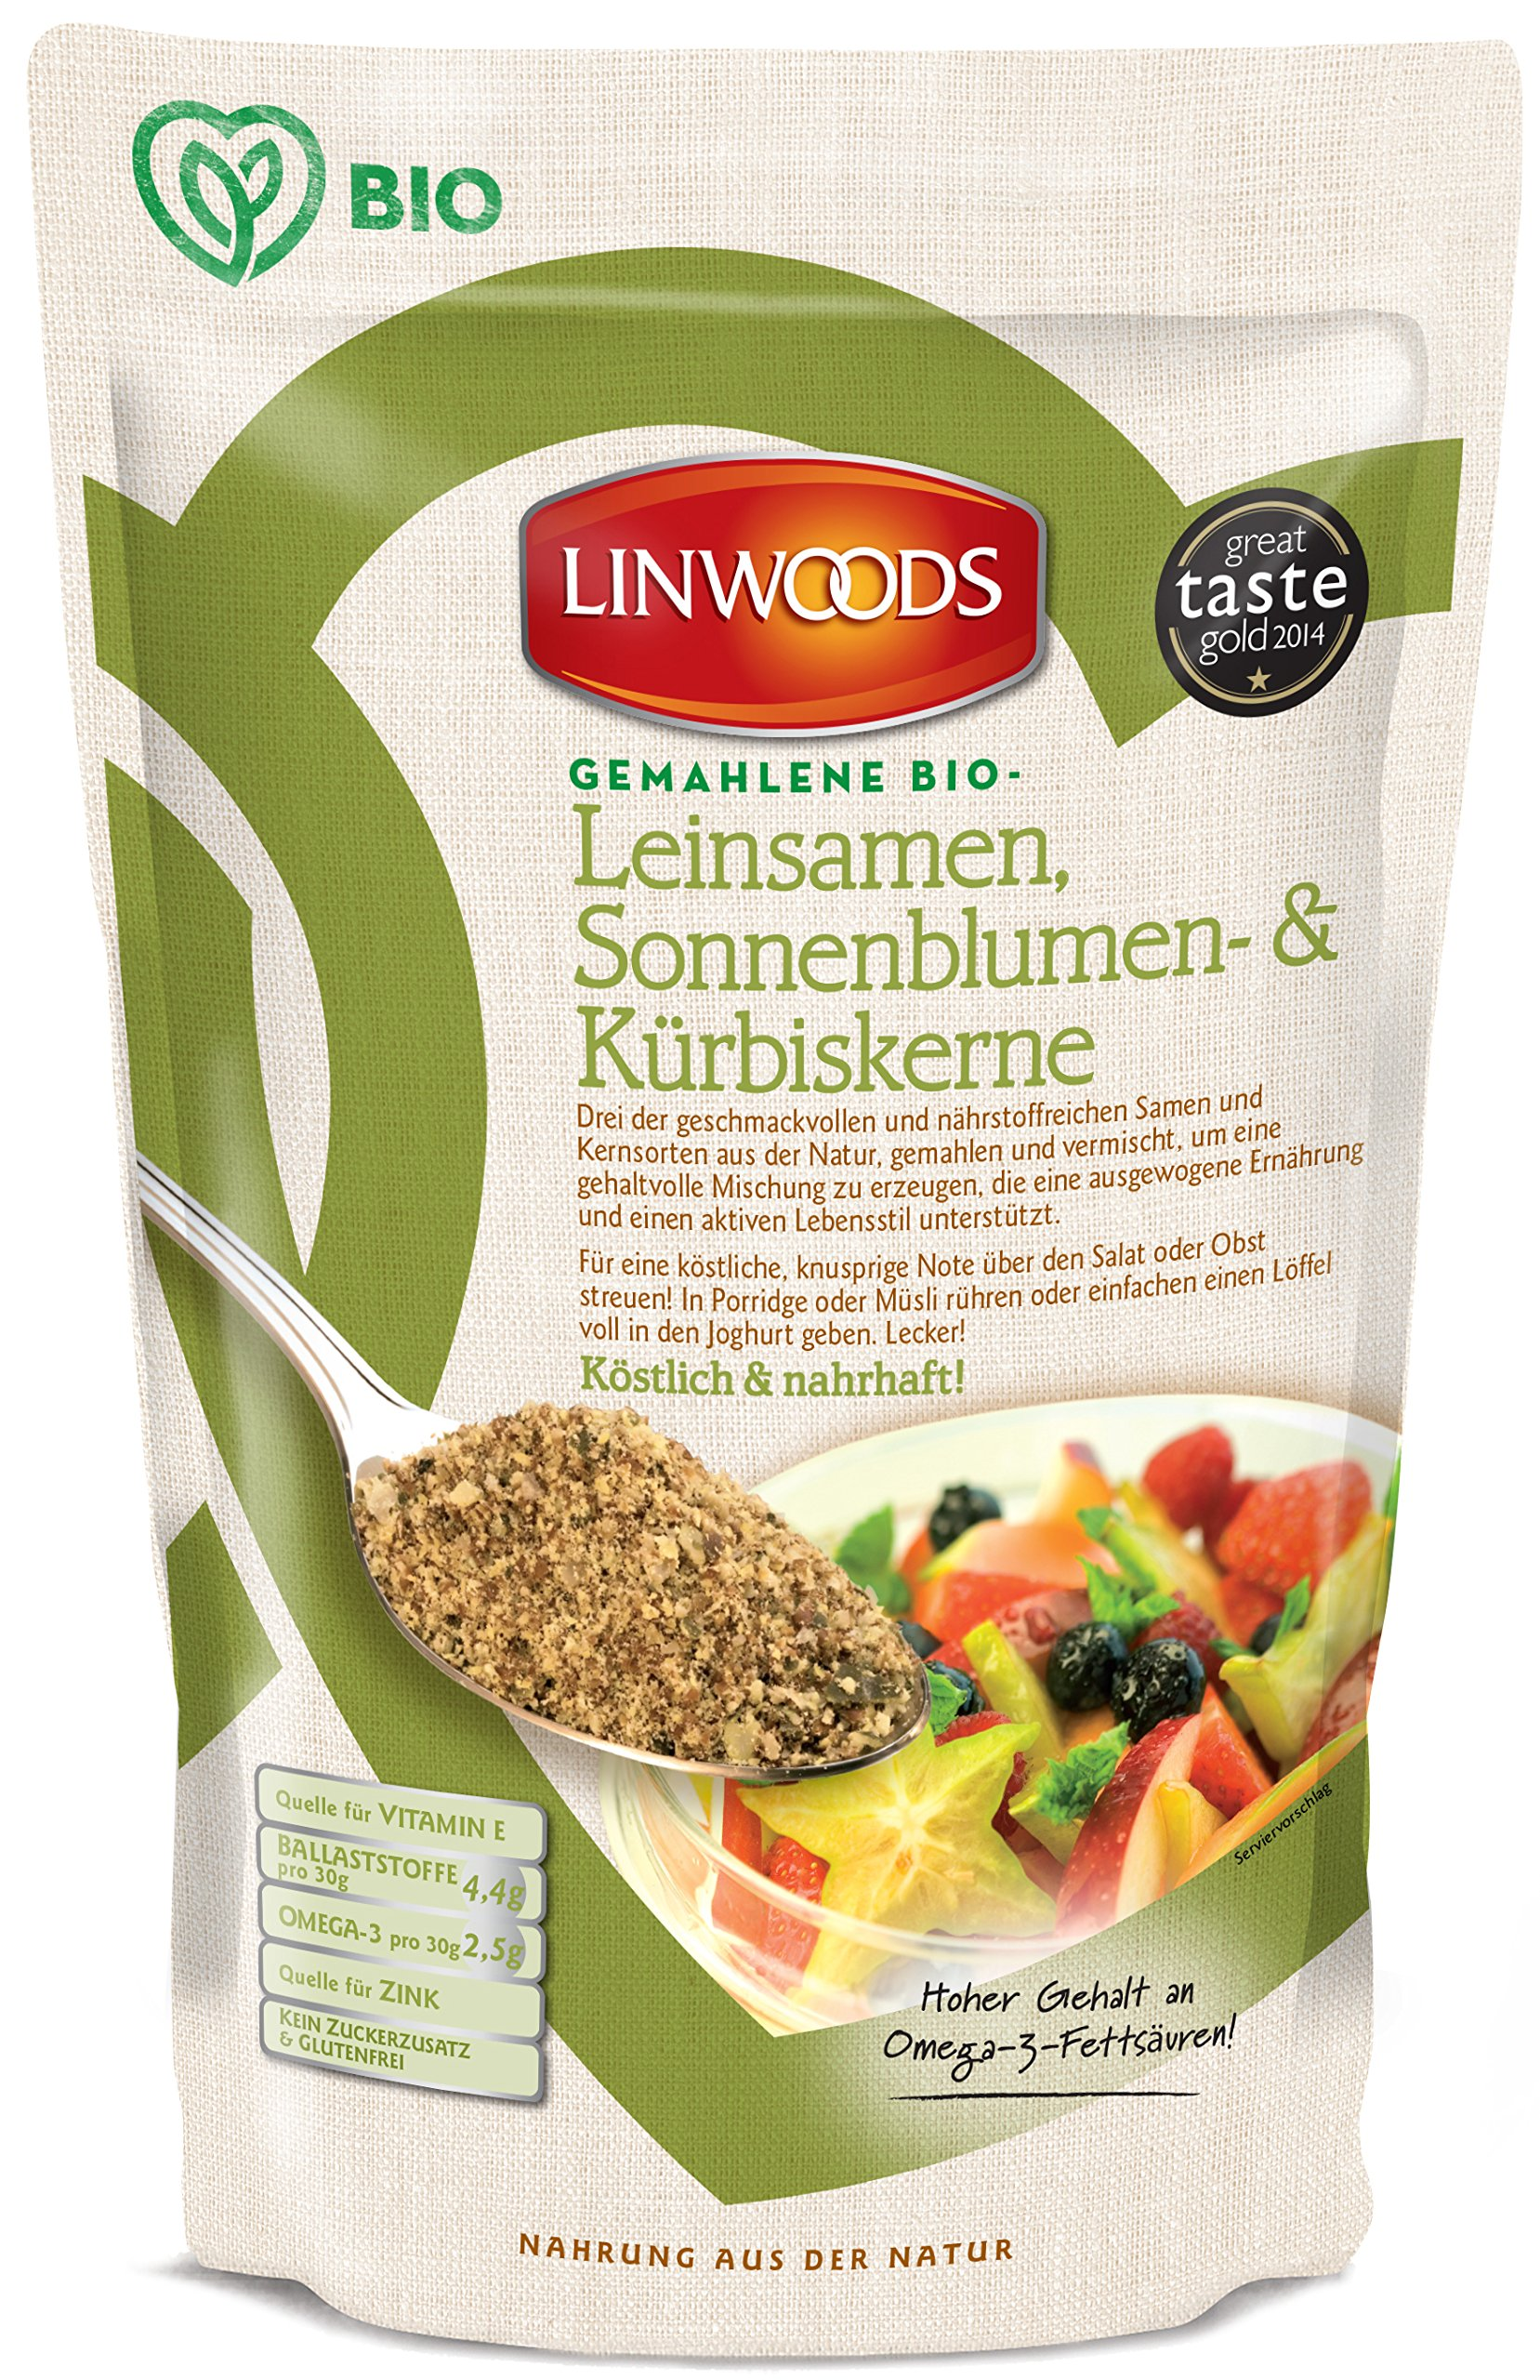 Linwoods Milled Organic Flaxseed Sunflower & Pumpkin Seeds (200g)